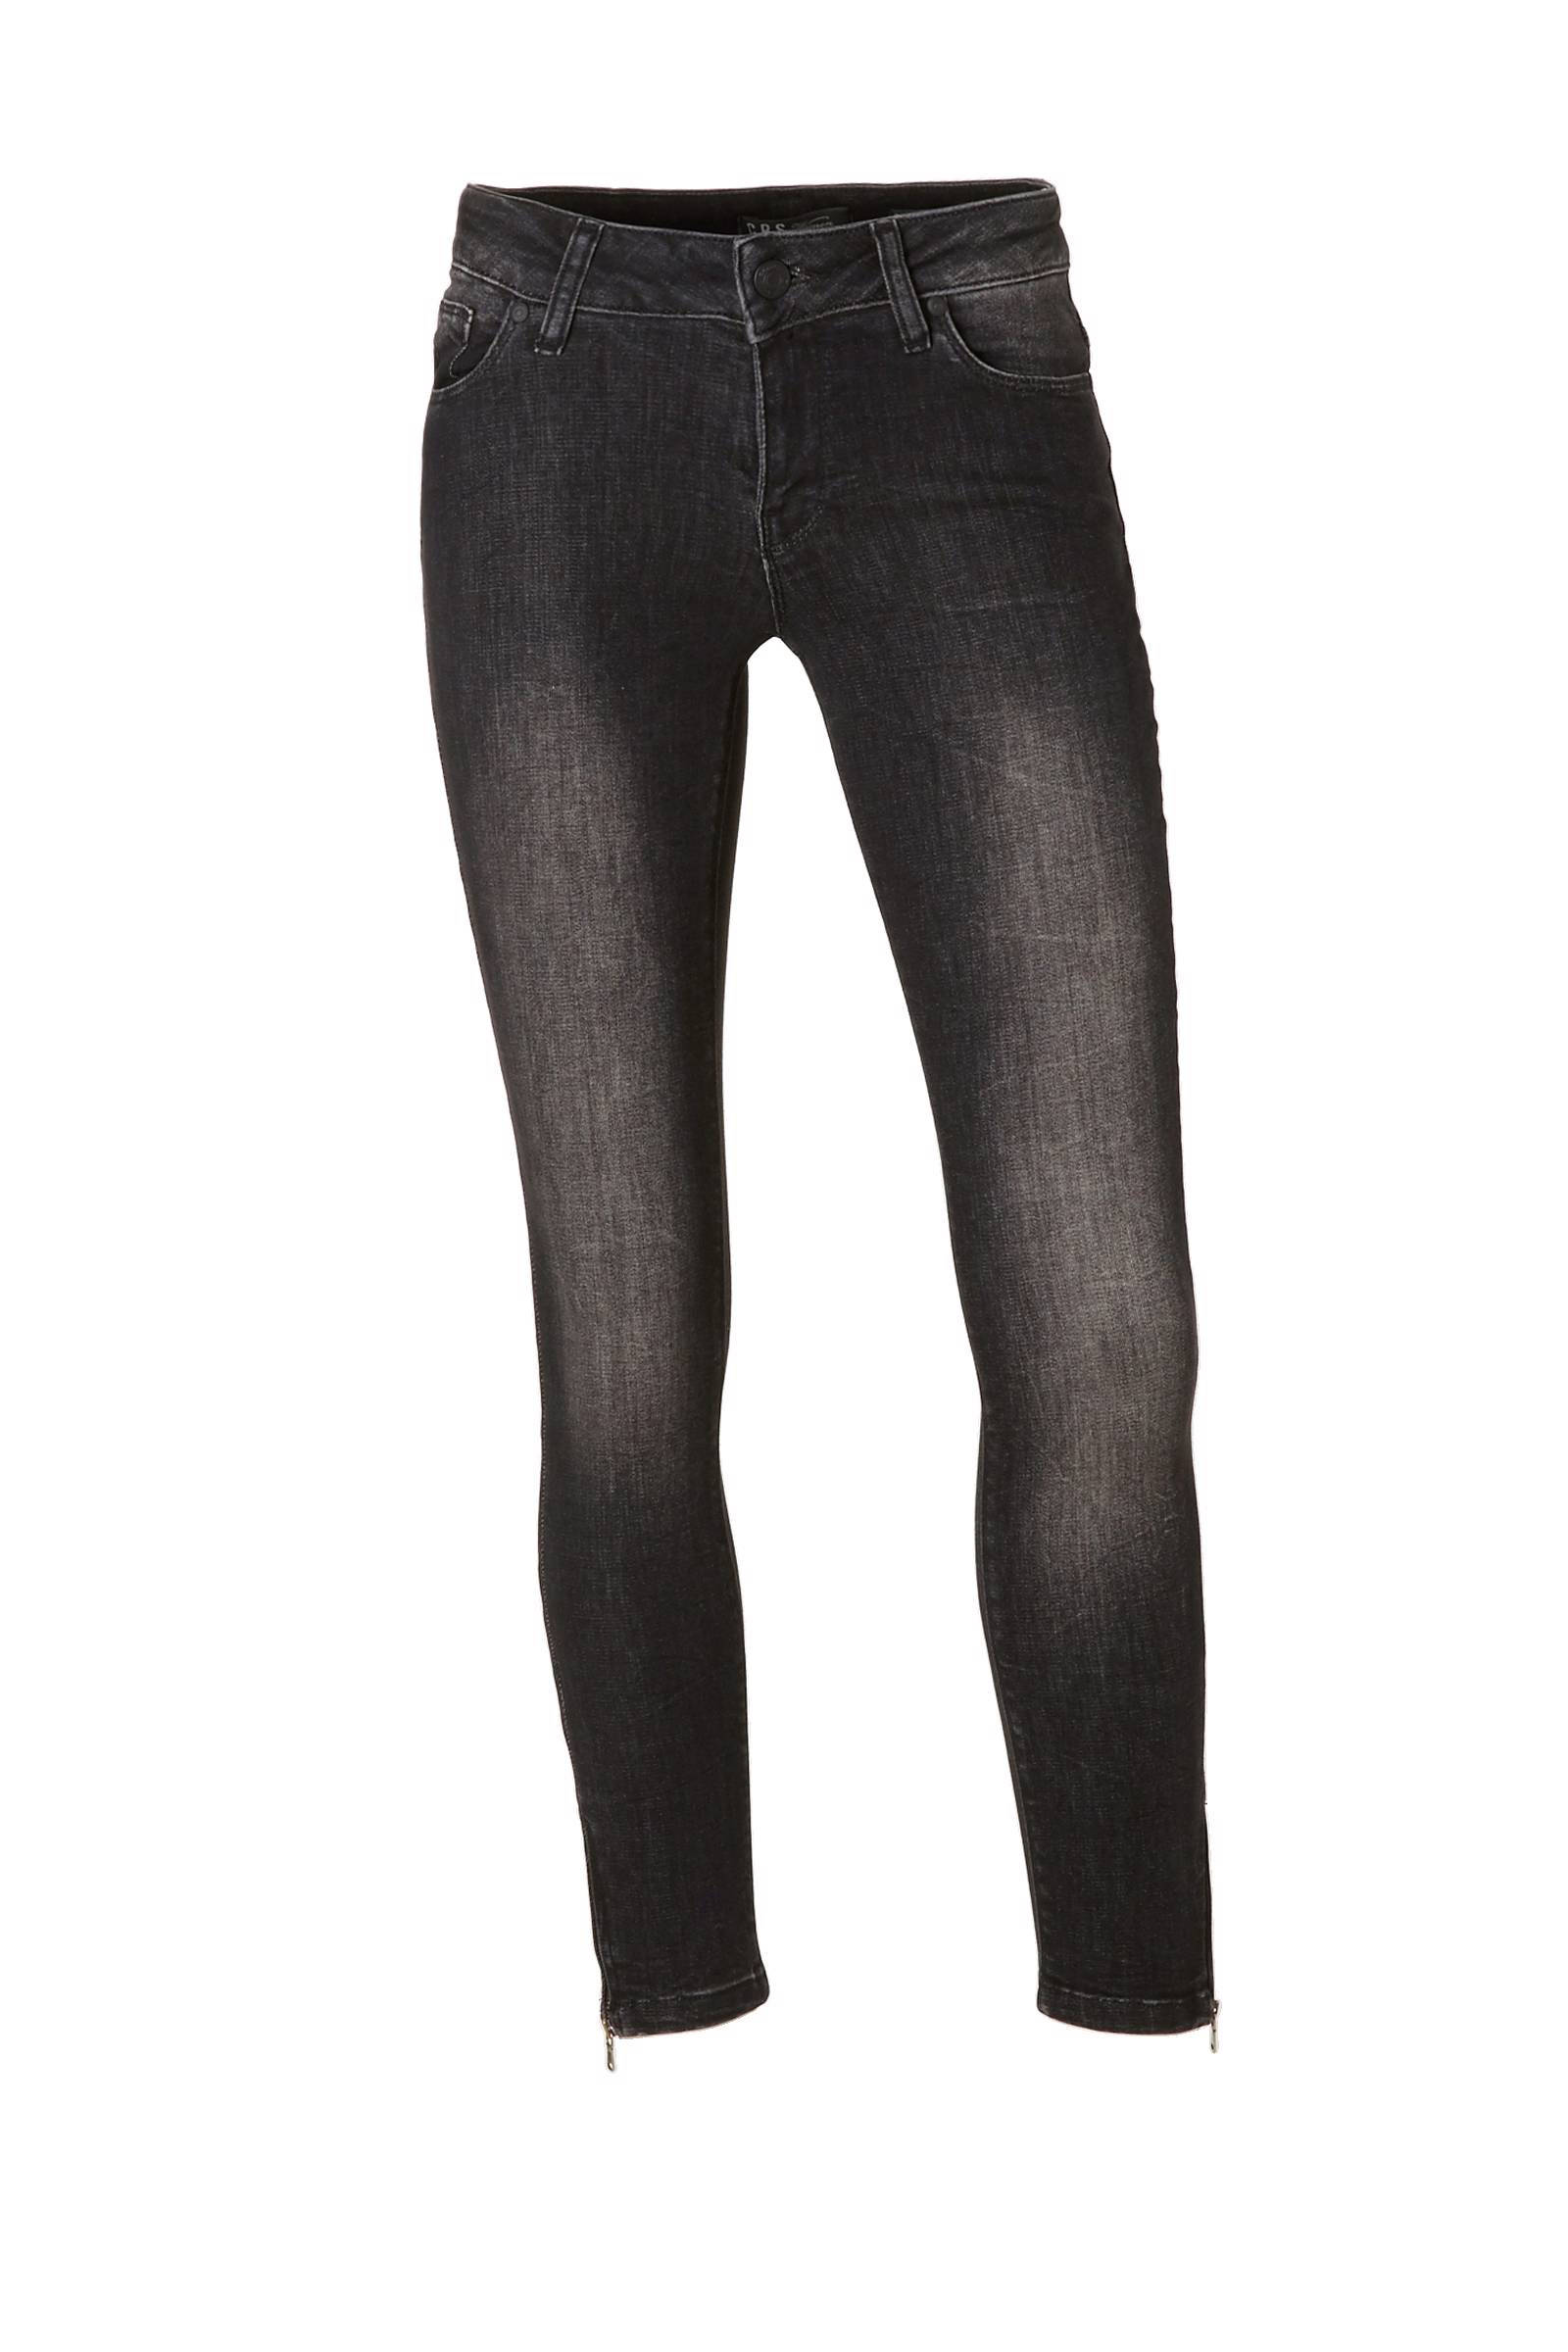 Koblenka cropped skinny fit jeans